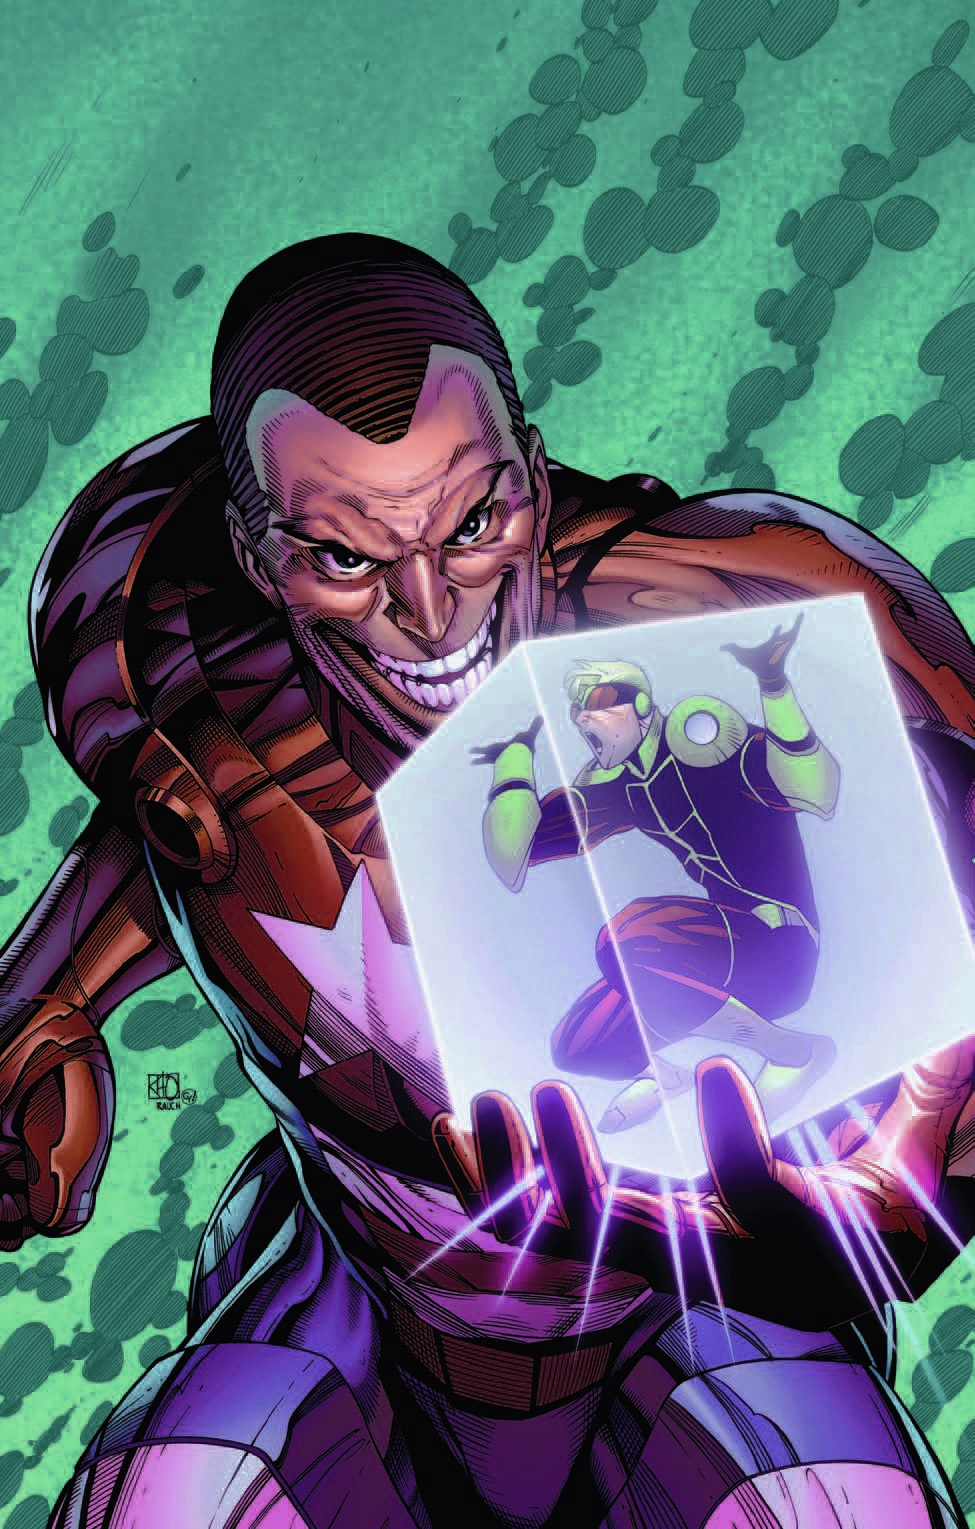 Mighty Avengers Vol 1 33 Textless.jpg